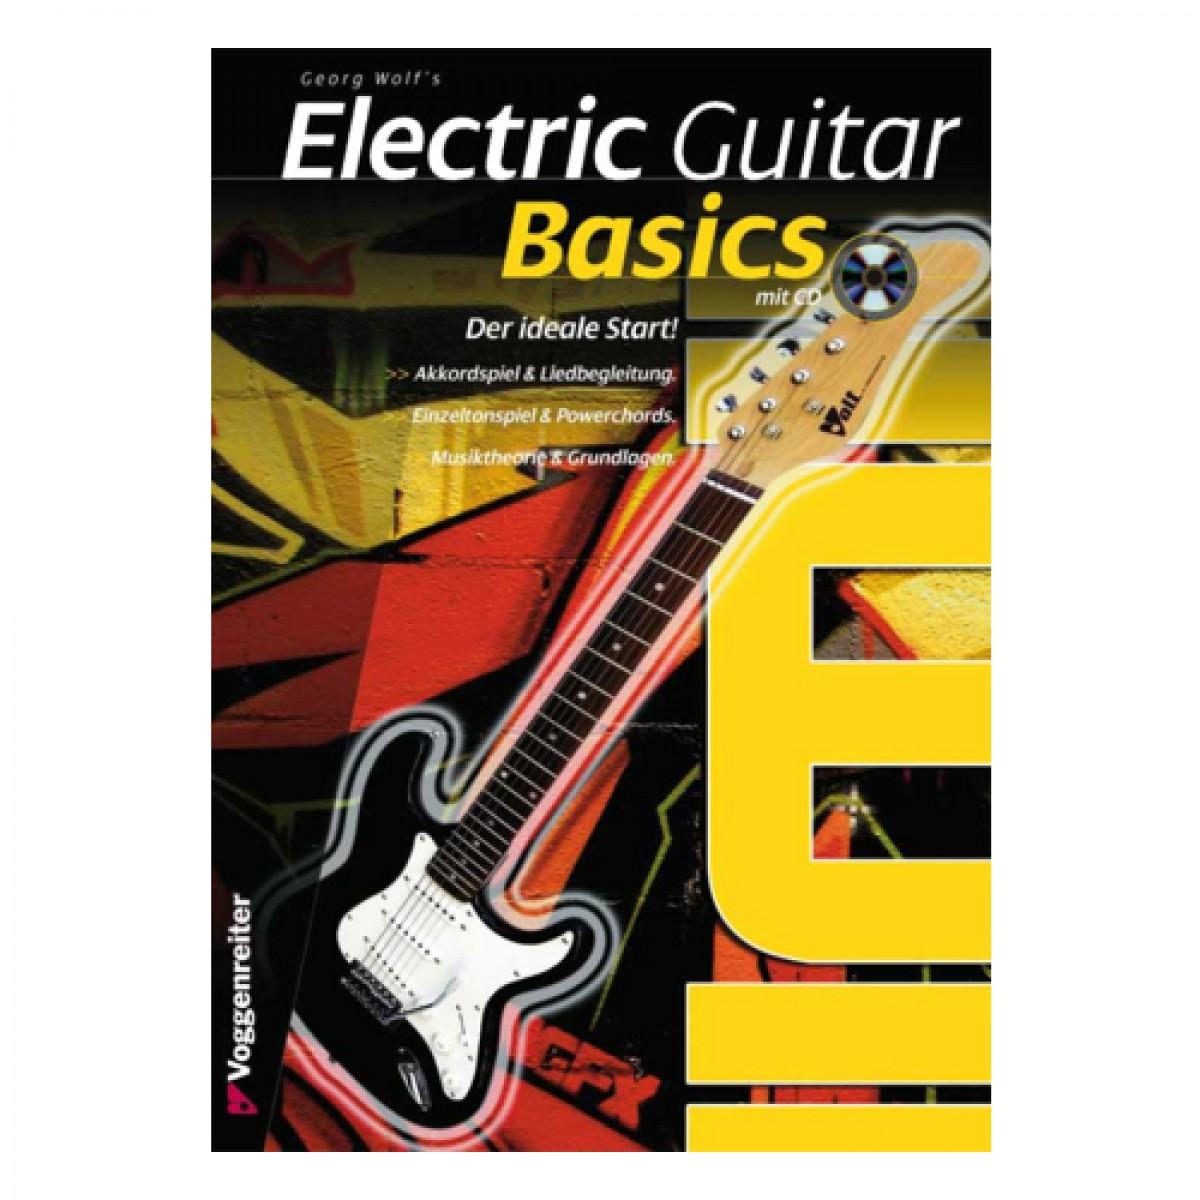 Gitarrenschule E-Gitarre